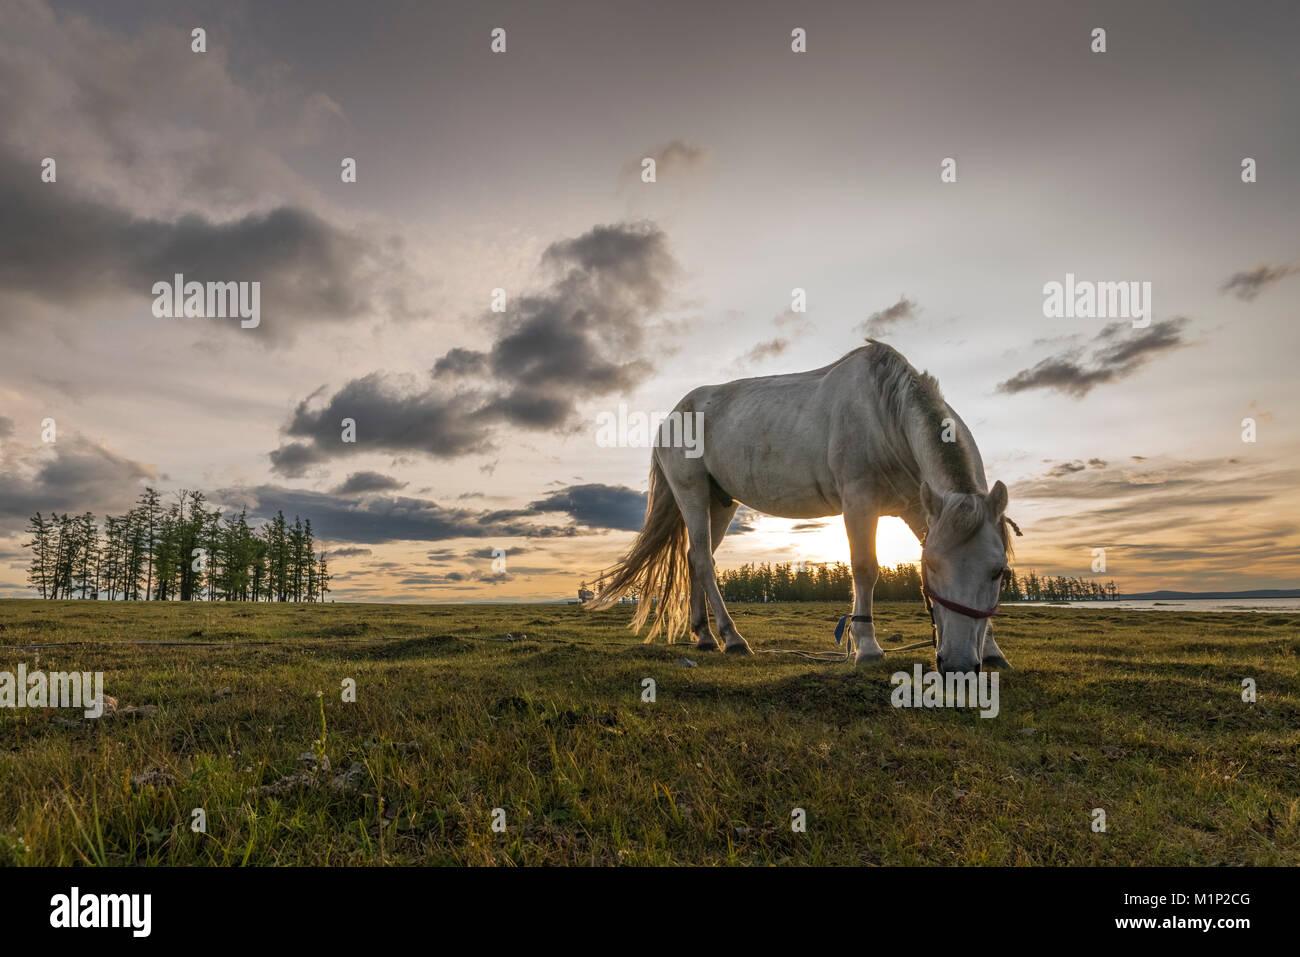 Pferd Weiden am Ufer des Hovsgol See bei Sonnenuntergang, Provinz Hovsgol, Mongolei, Zentralasien, Asien Stockbild